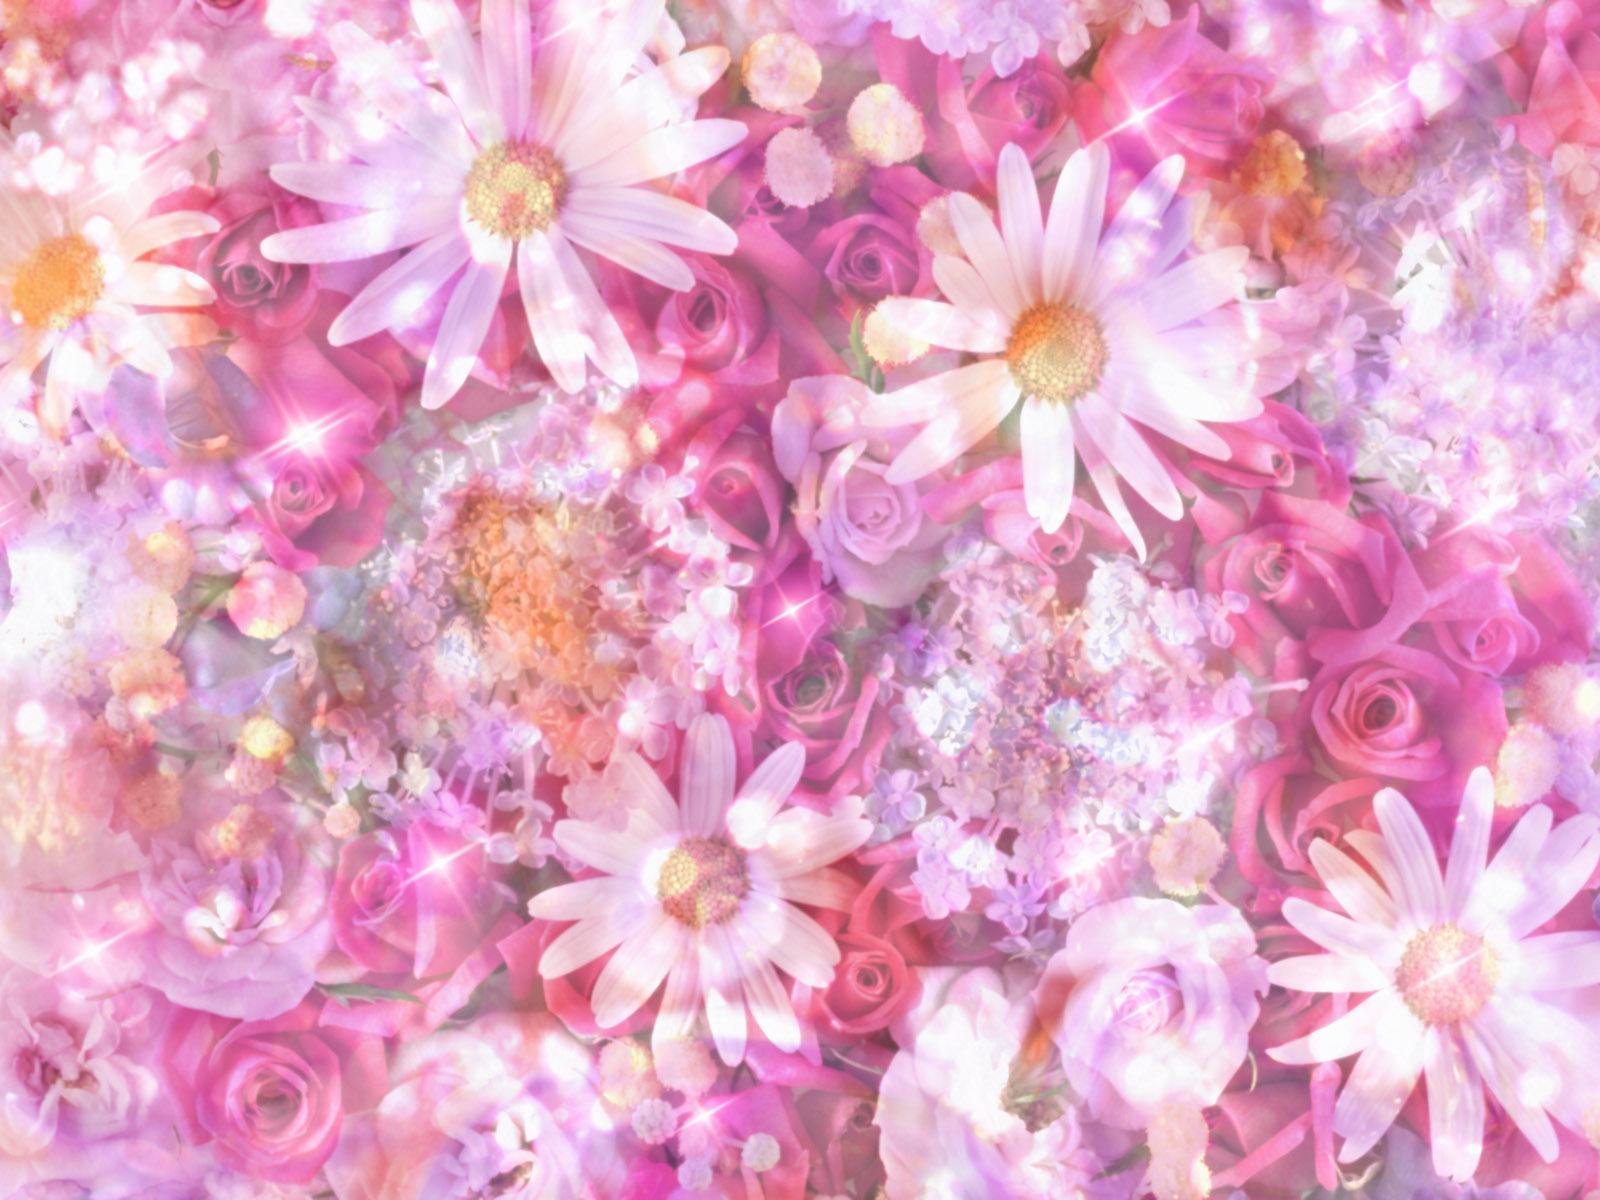 Free Colorful Flower Wallpaper Downloads: HD Wallpapers Colorful Flowers Desktop Backgrounds